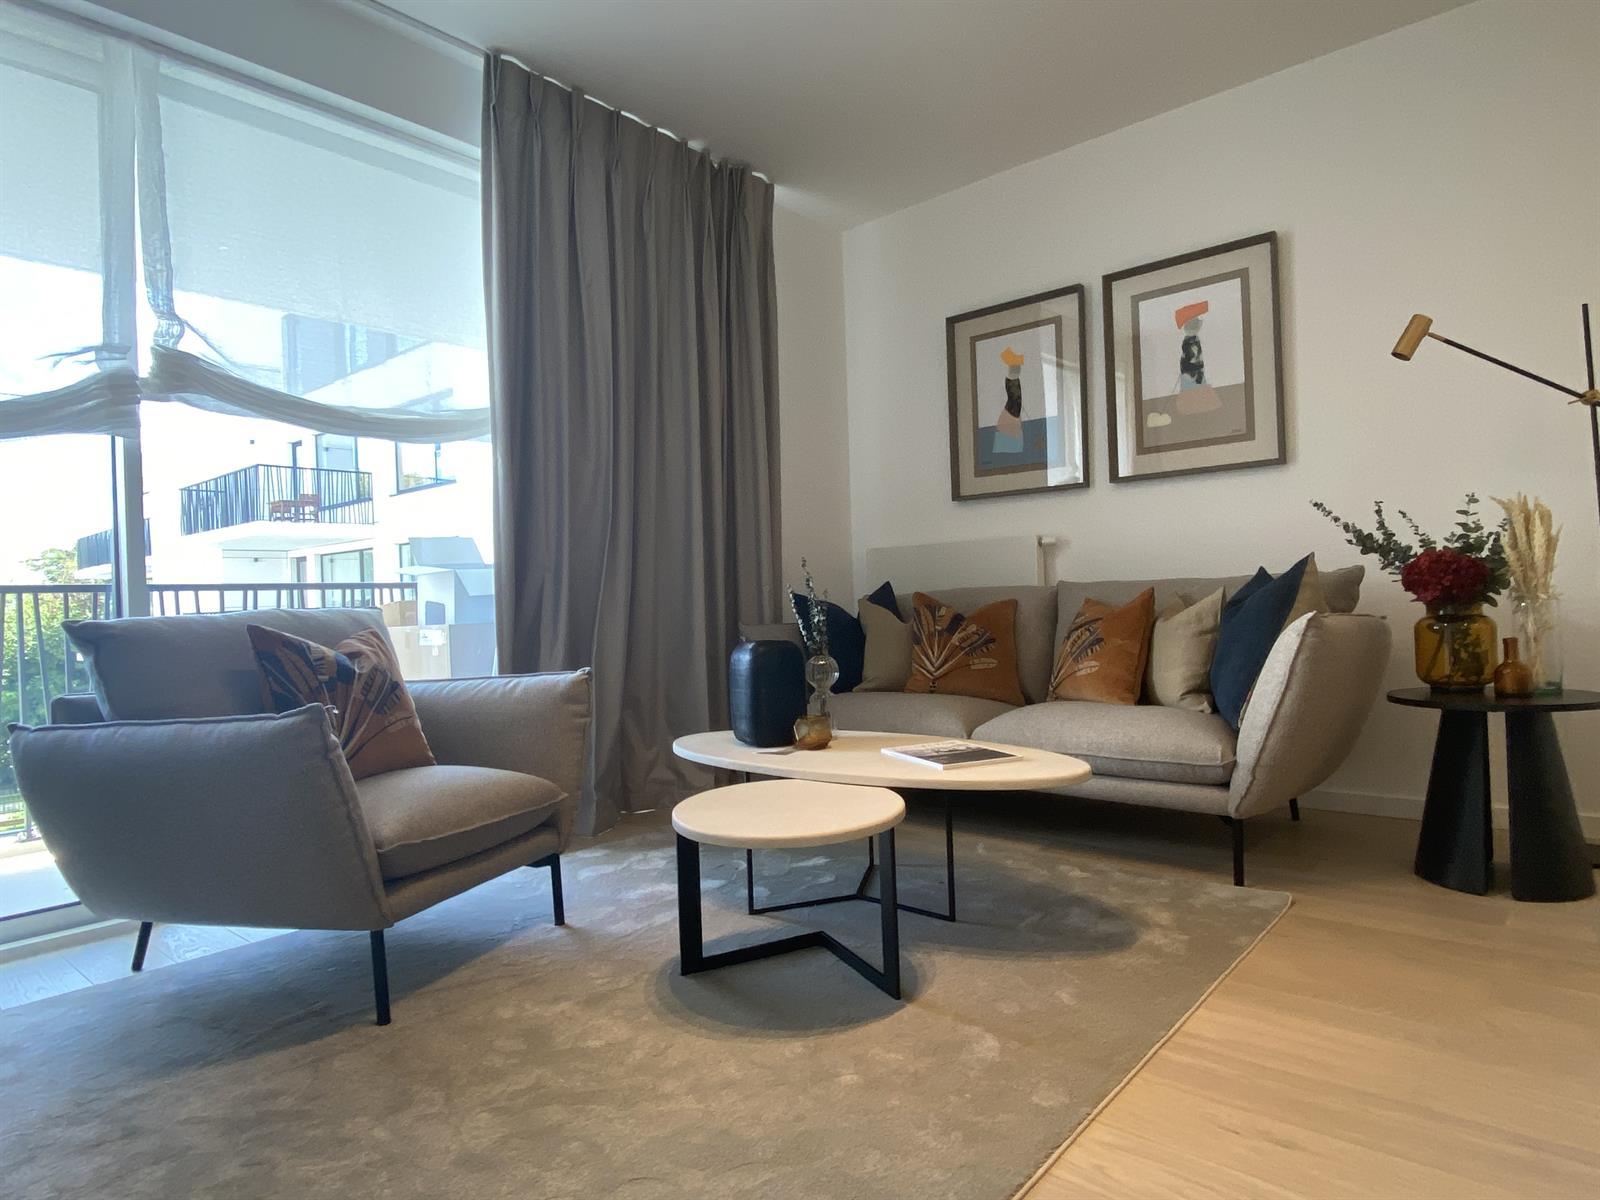 Appartement - Woluwe-Saint-Lambert - #4455478-1